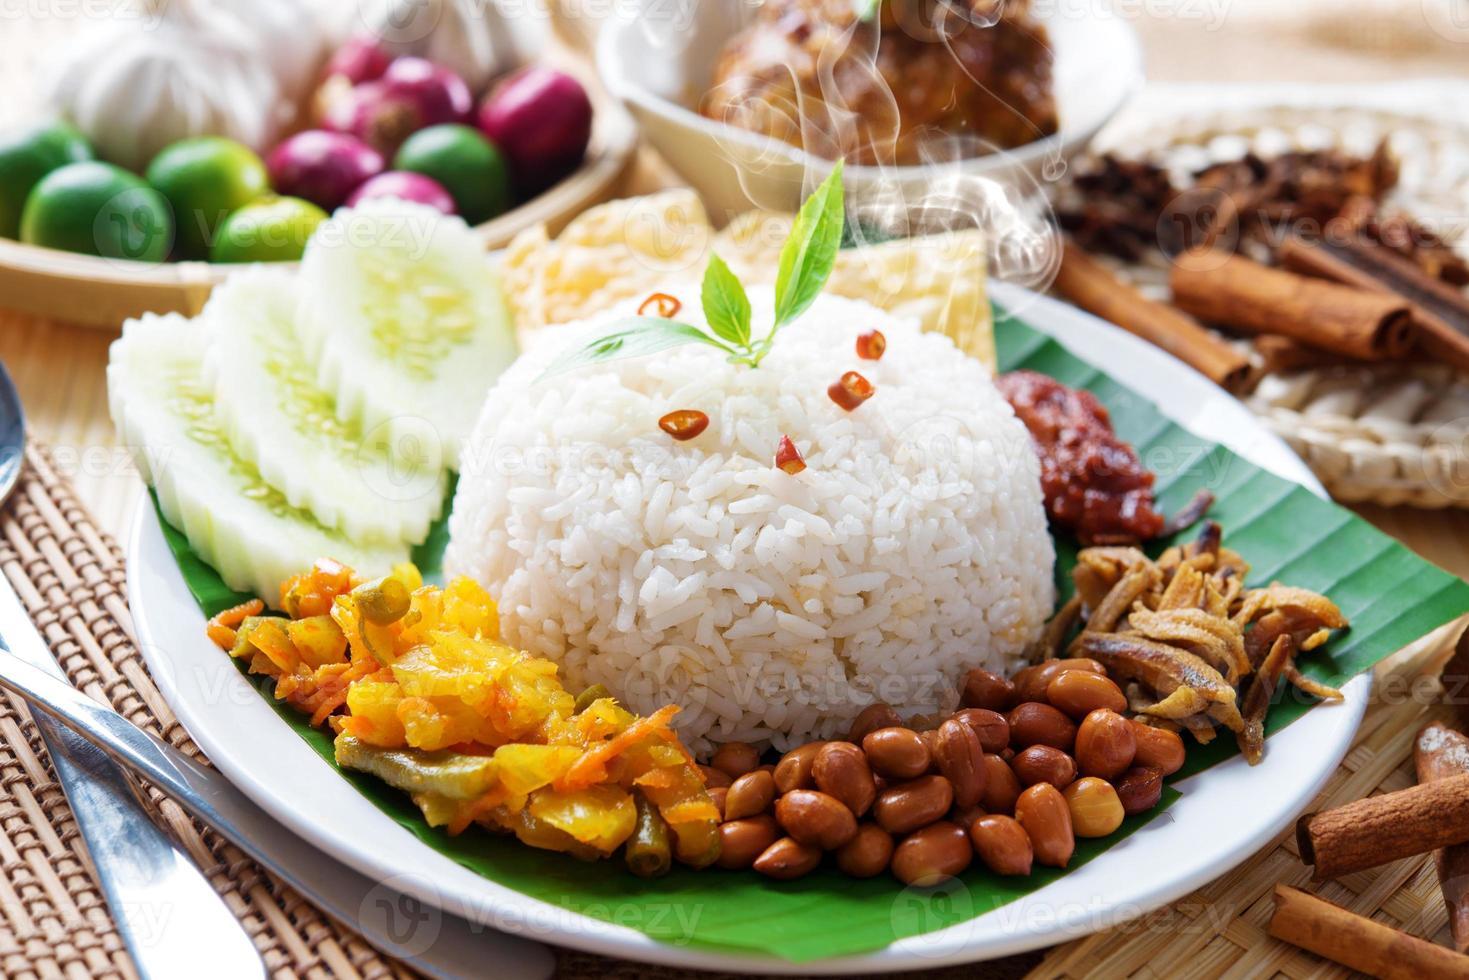 plat malaisien nasi lemak photo